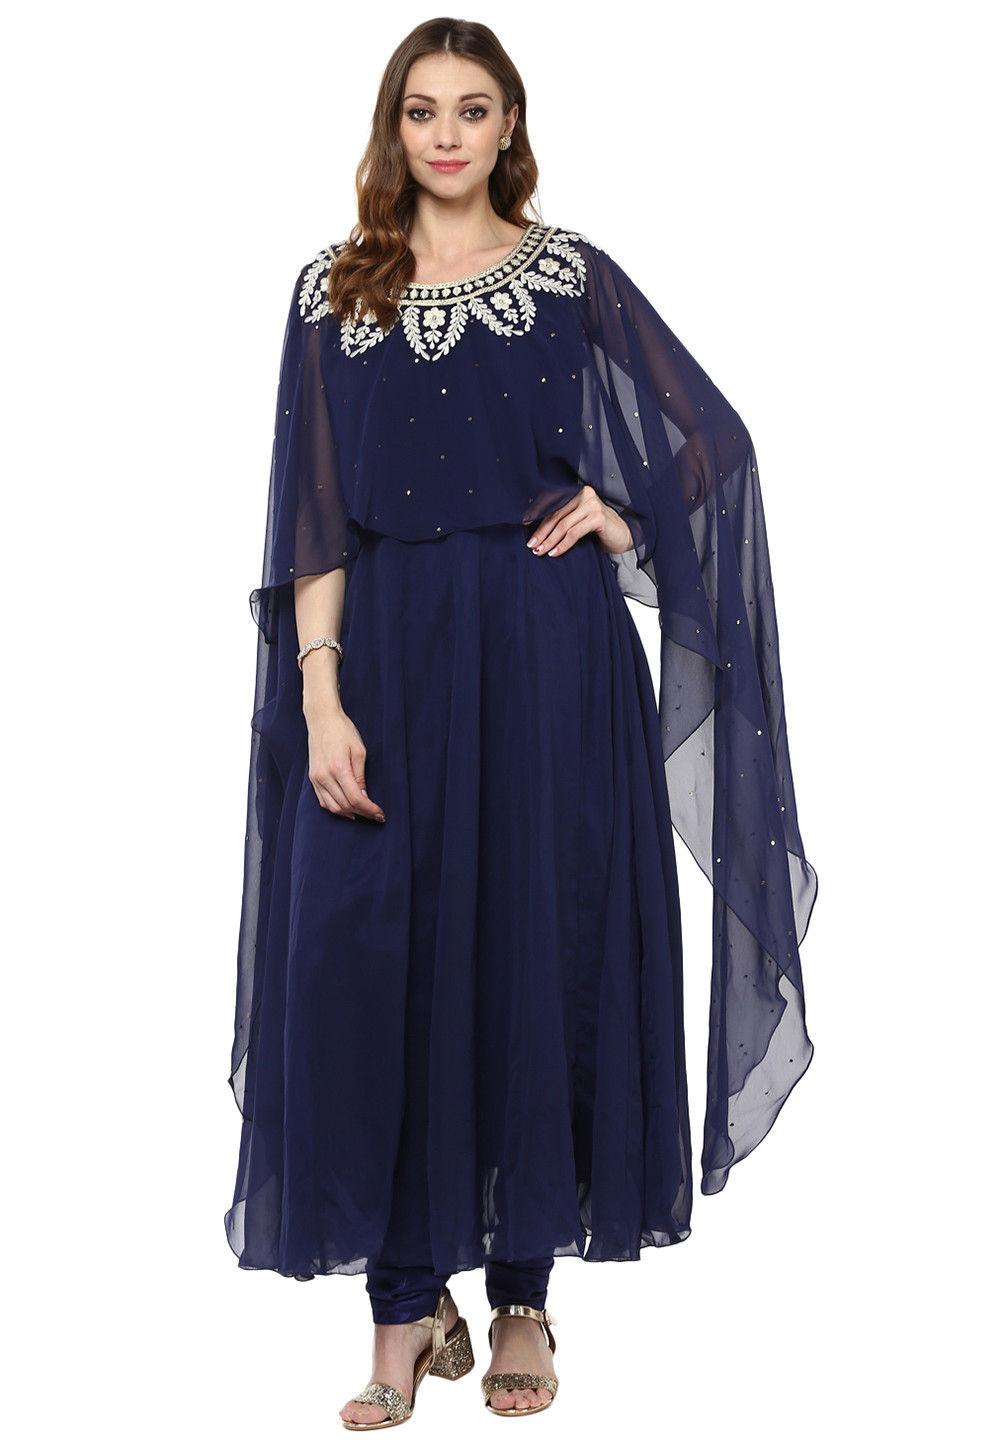 Embroidered Neckline Georgette Anarkali Suit in Navy Blue